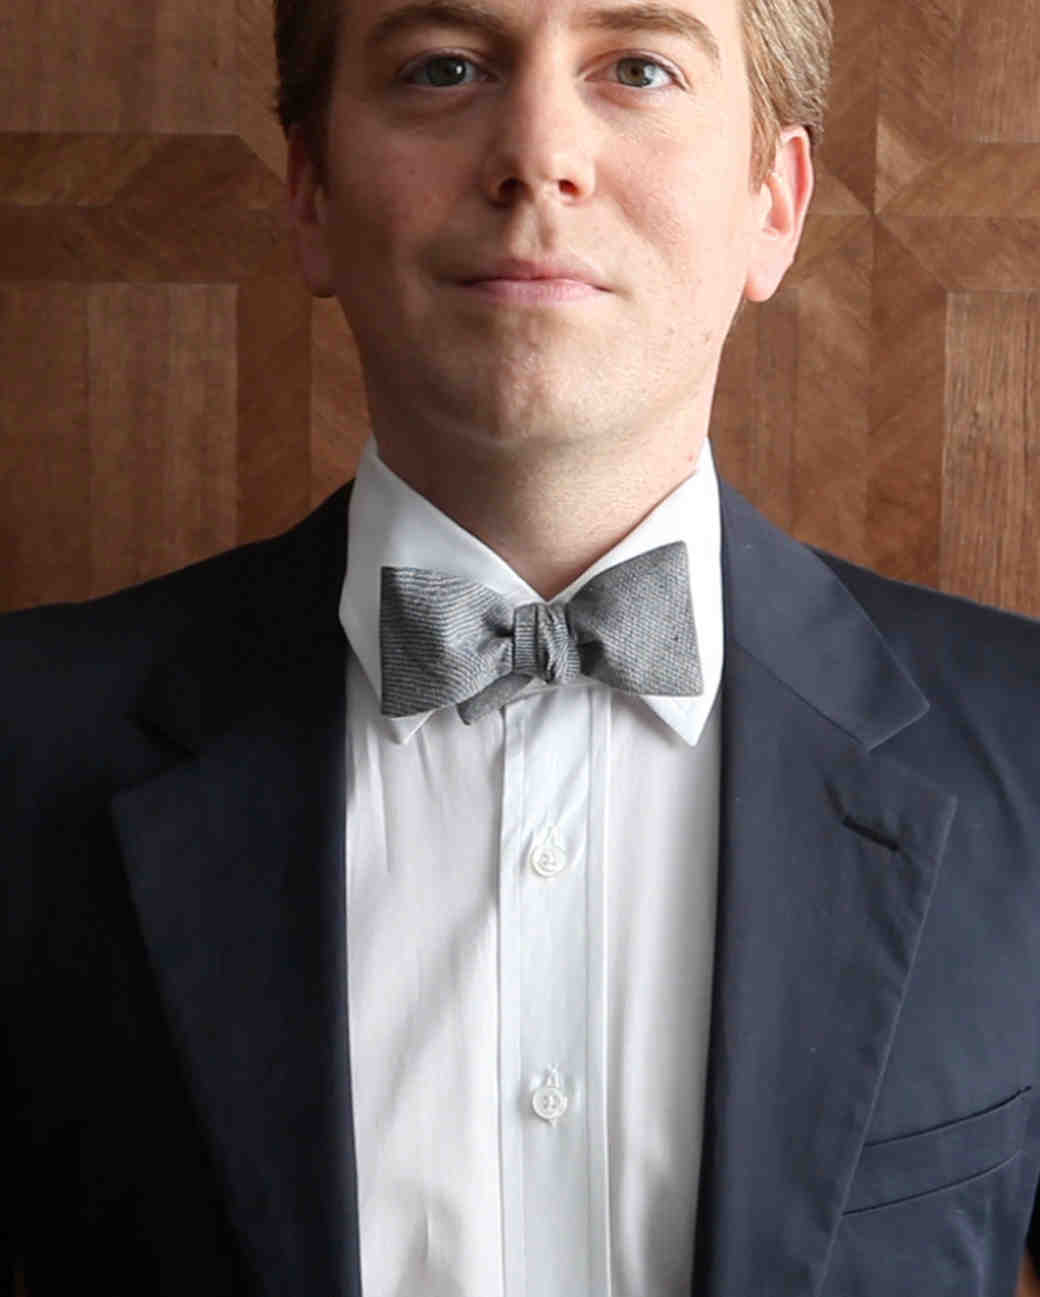 tie-video-screen-grabs-bow-tie-0715.jpg